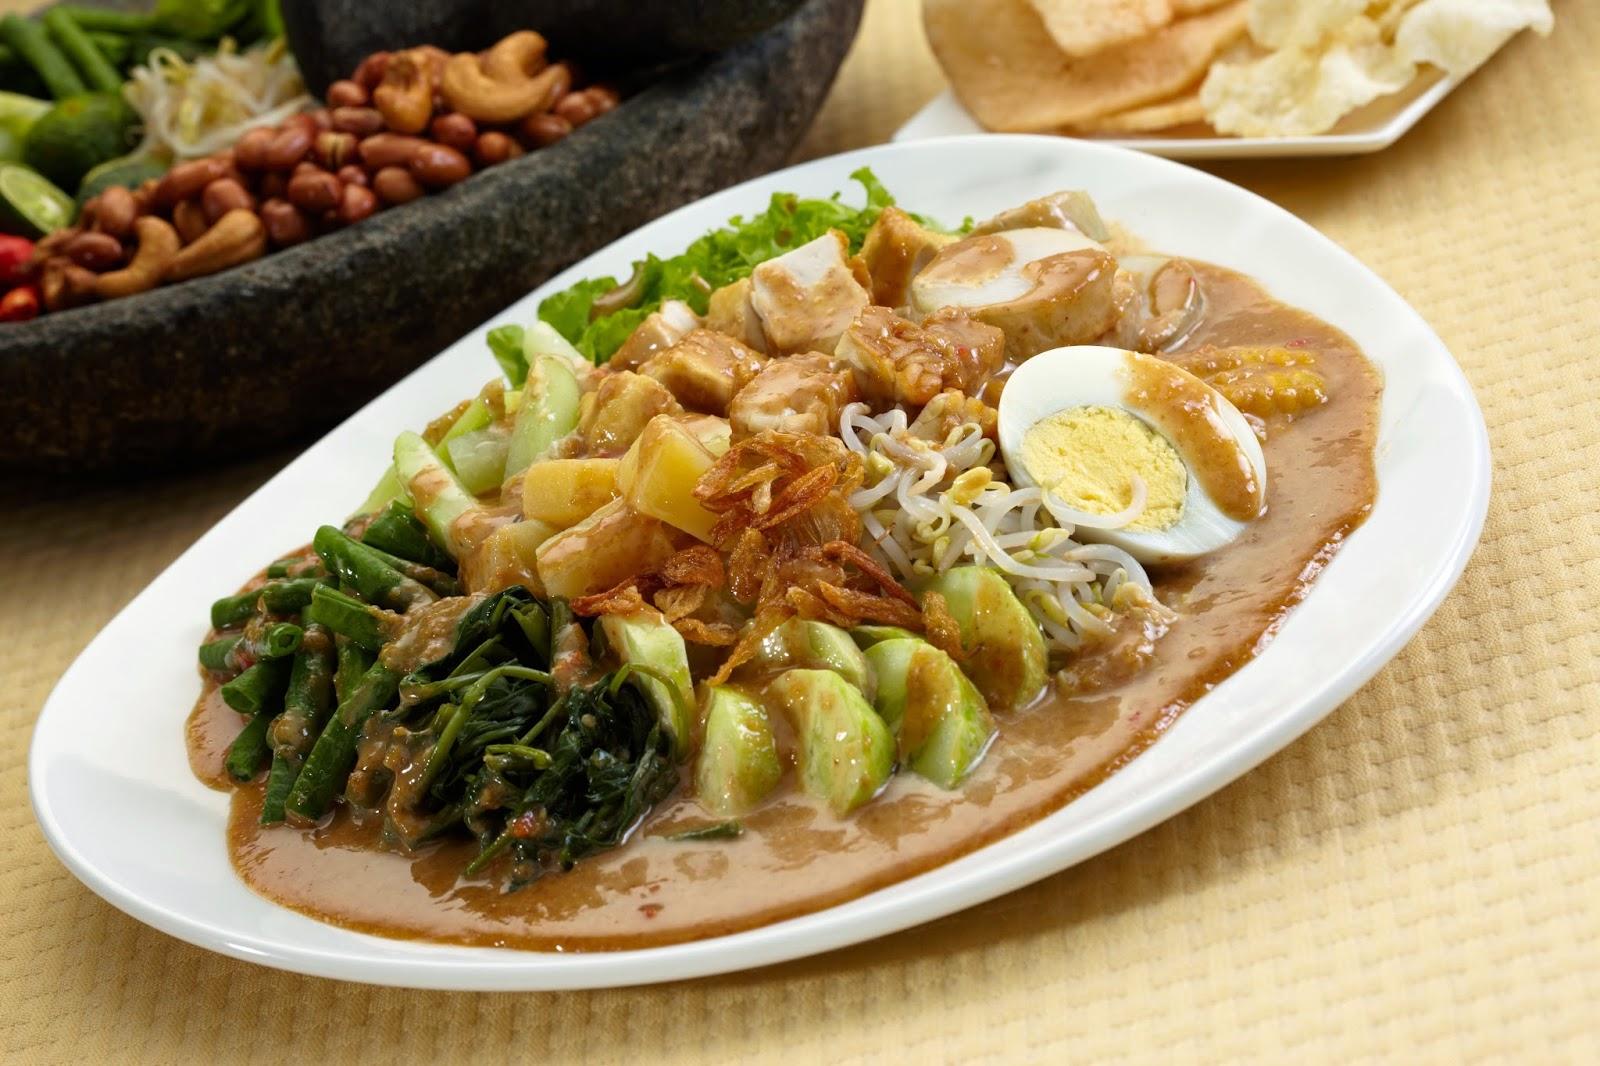 Isi Kandungan Gizi Gado-Gado - Komposisi Nutrisi Bahan Makanan